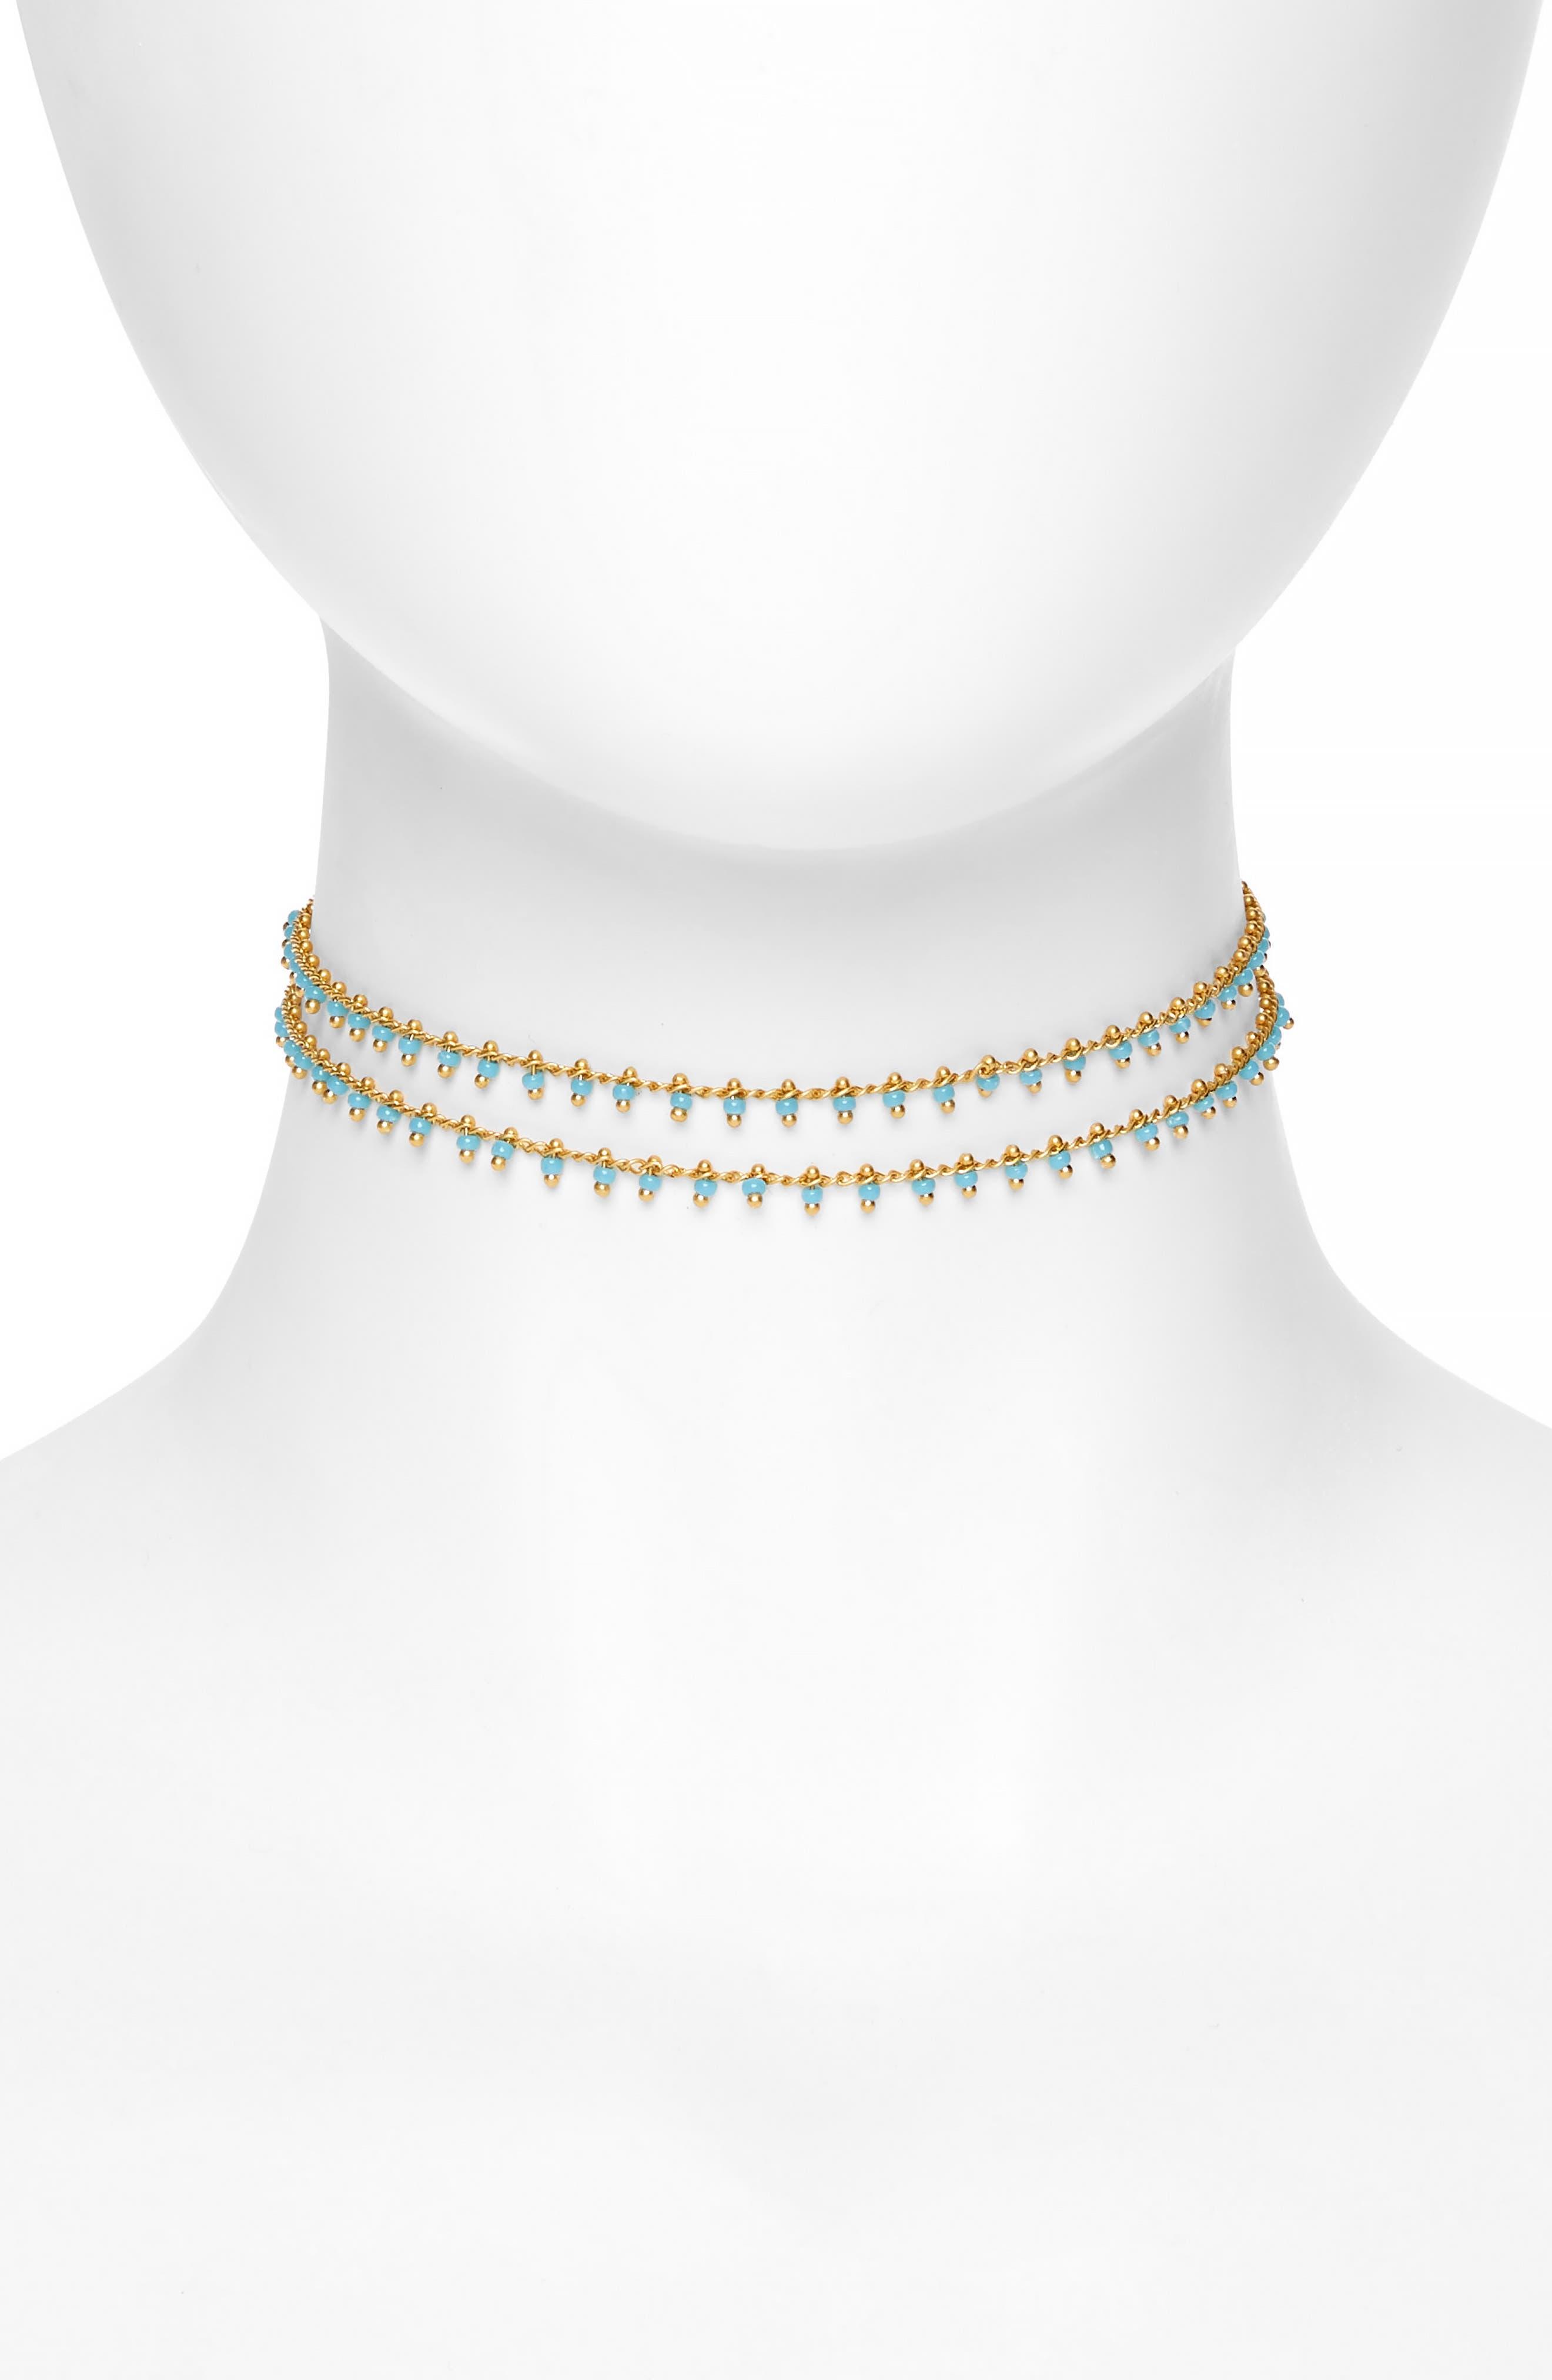 Beadlink Choker Necklace,                             Main thumbnail 2, color,